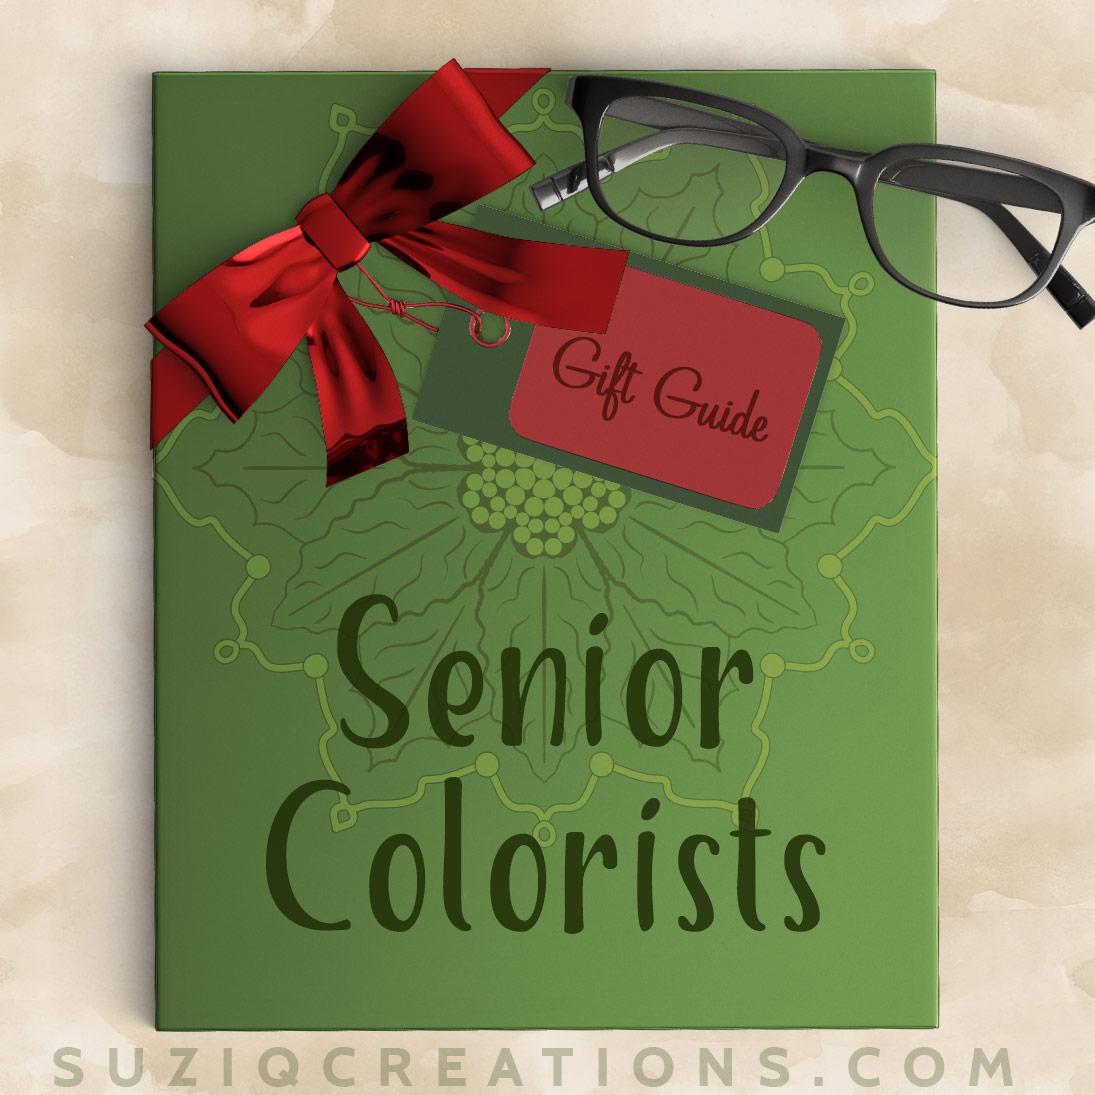 gifts for senior colorists suziq creations